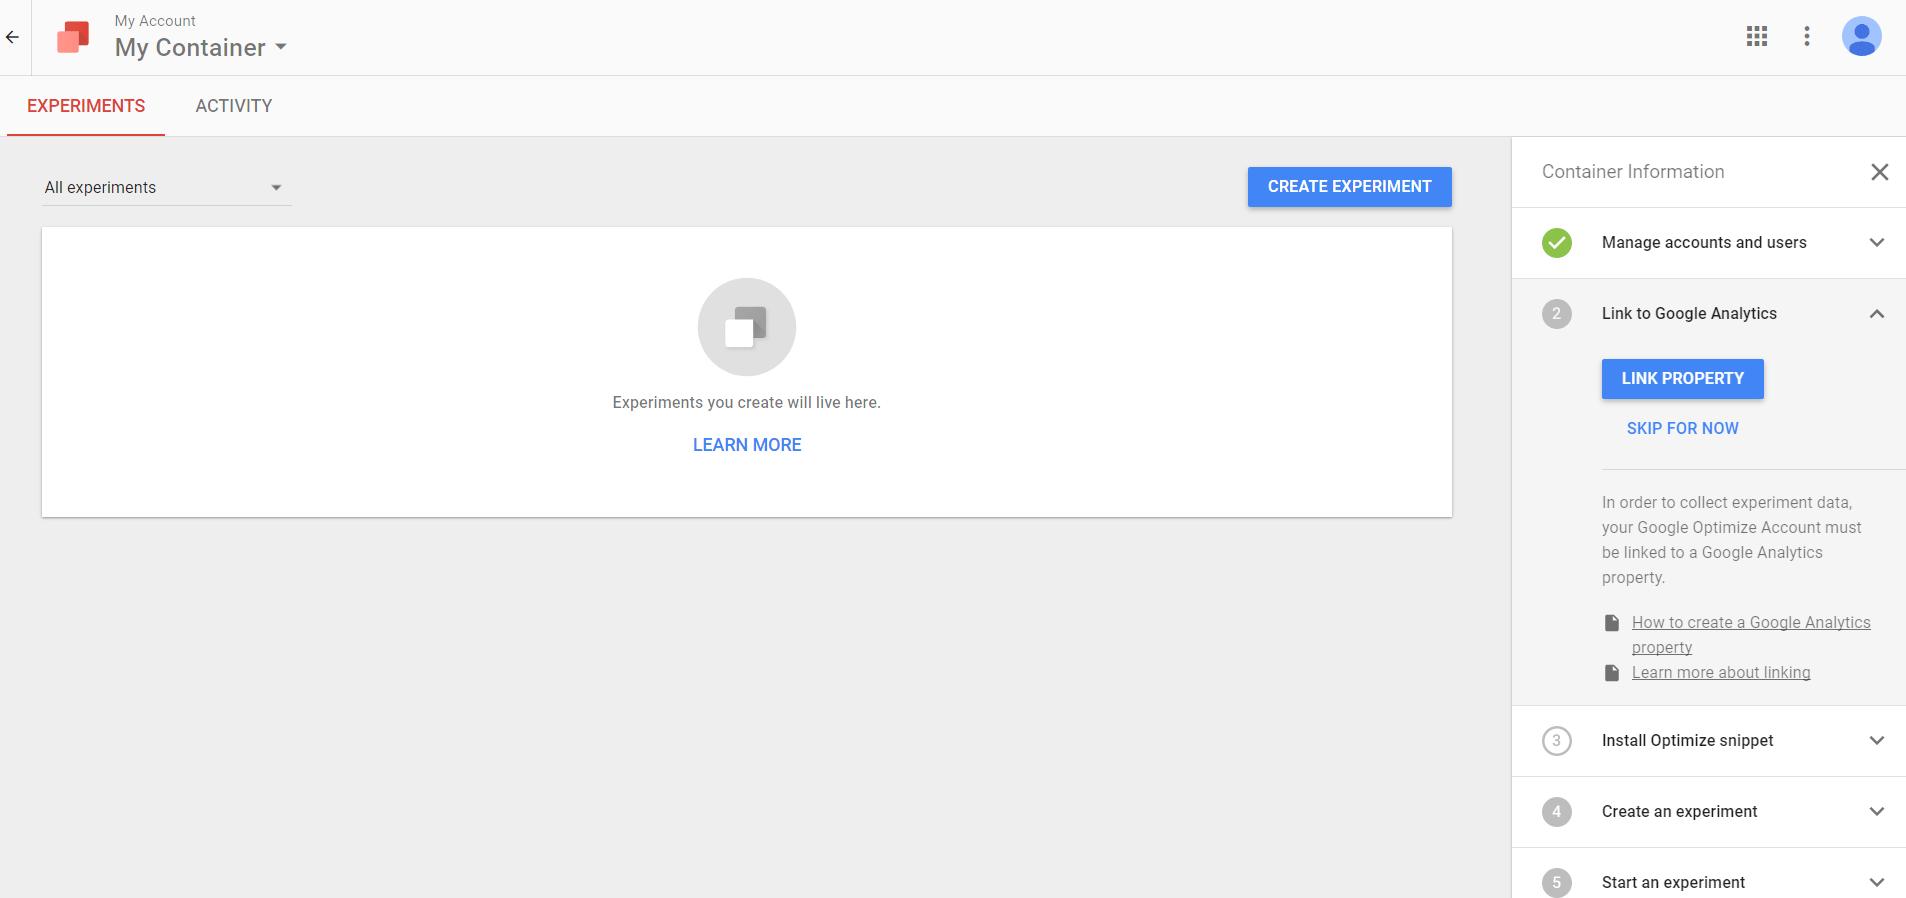 Bild: Google Optimize Account Übersicht